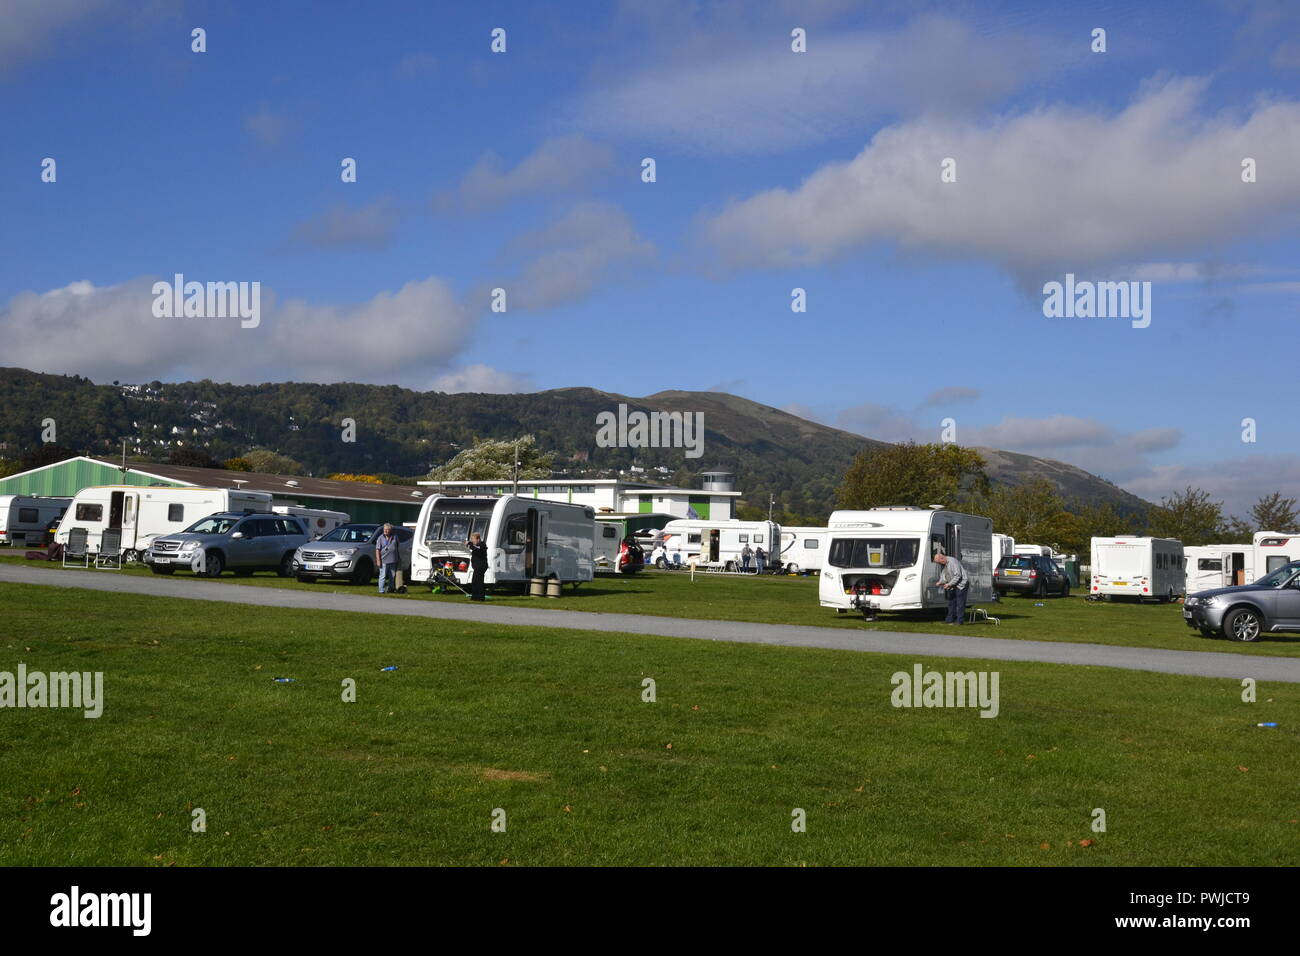 Caravans staying on site at the Malvern Caravan Show, Three Counties Showground, Malvern, Great Malvern, Worcestershire. - Stock Image